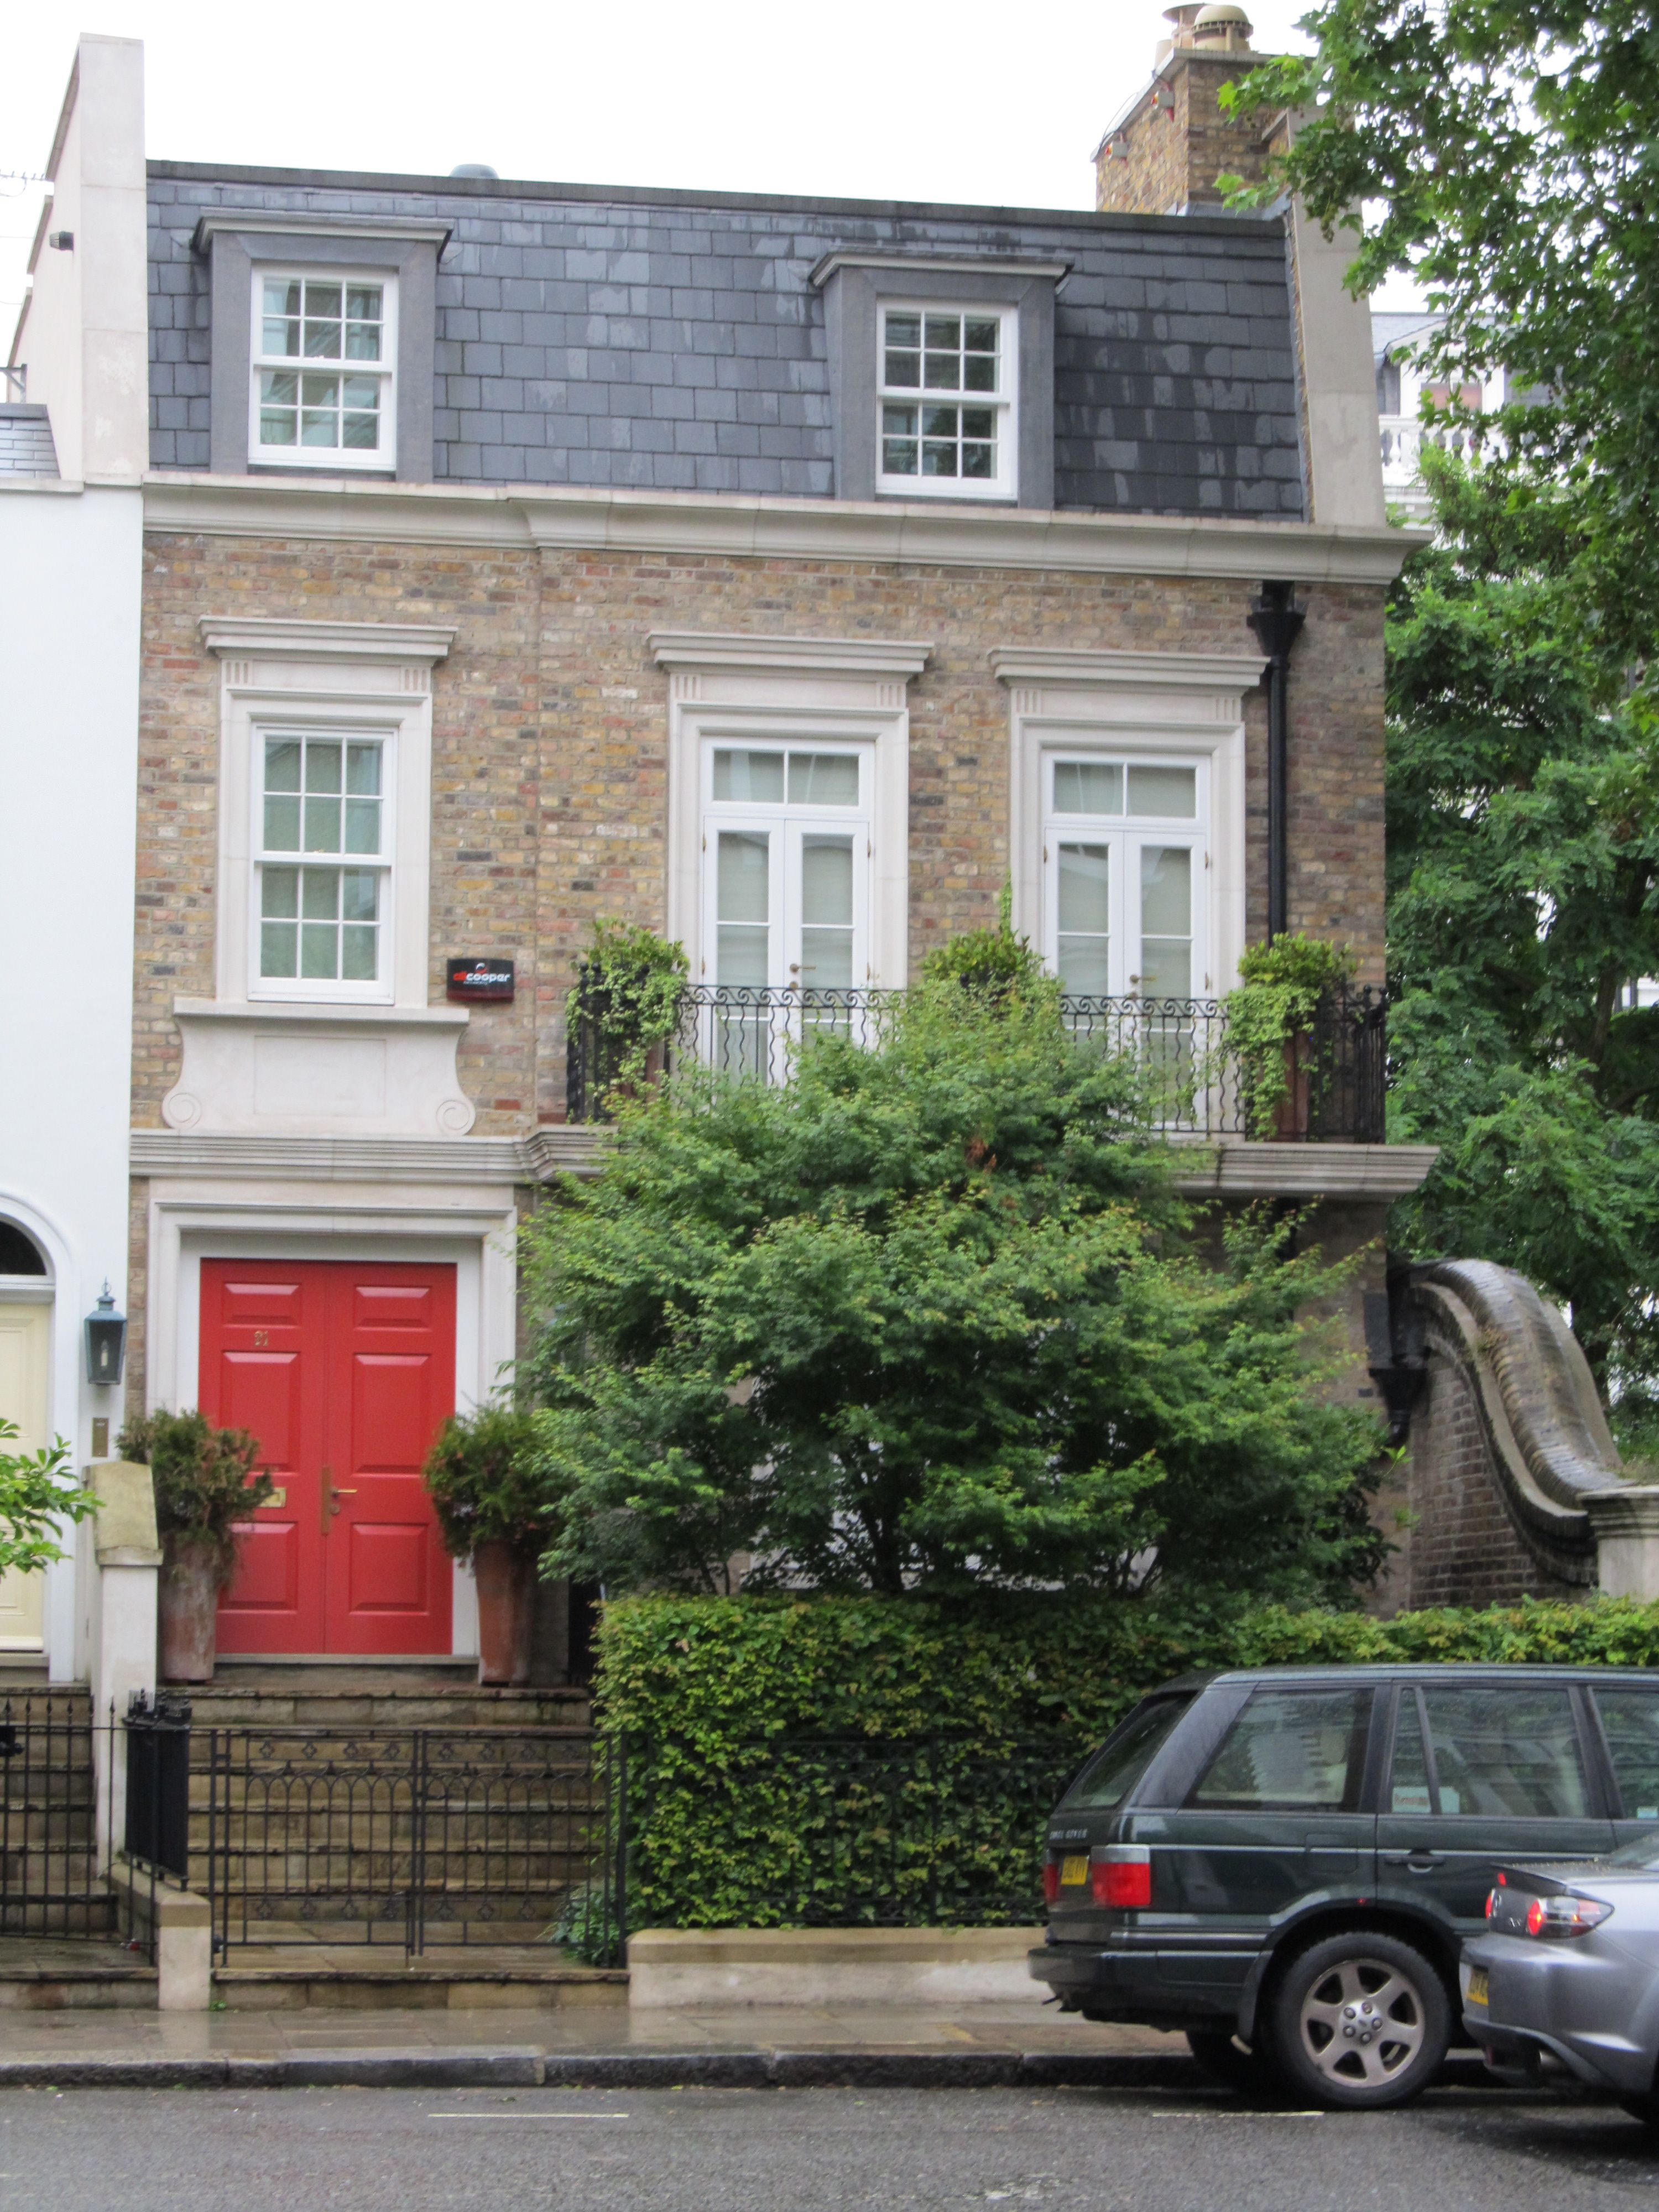 My Dream Home Interior Design Download: My Dream Home. Onslow Gardens, South Ken, London.